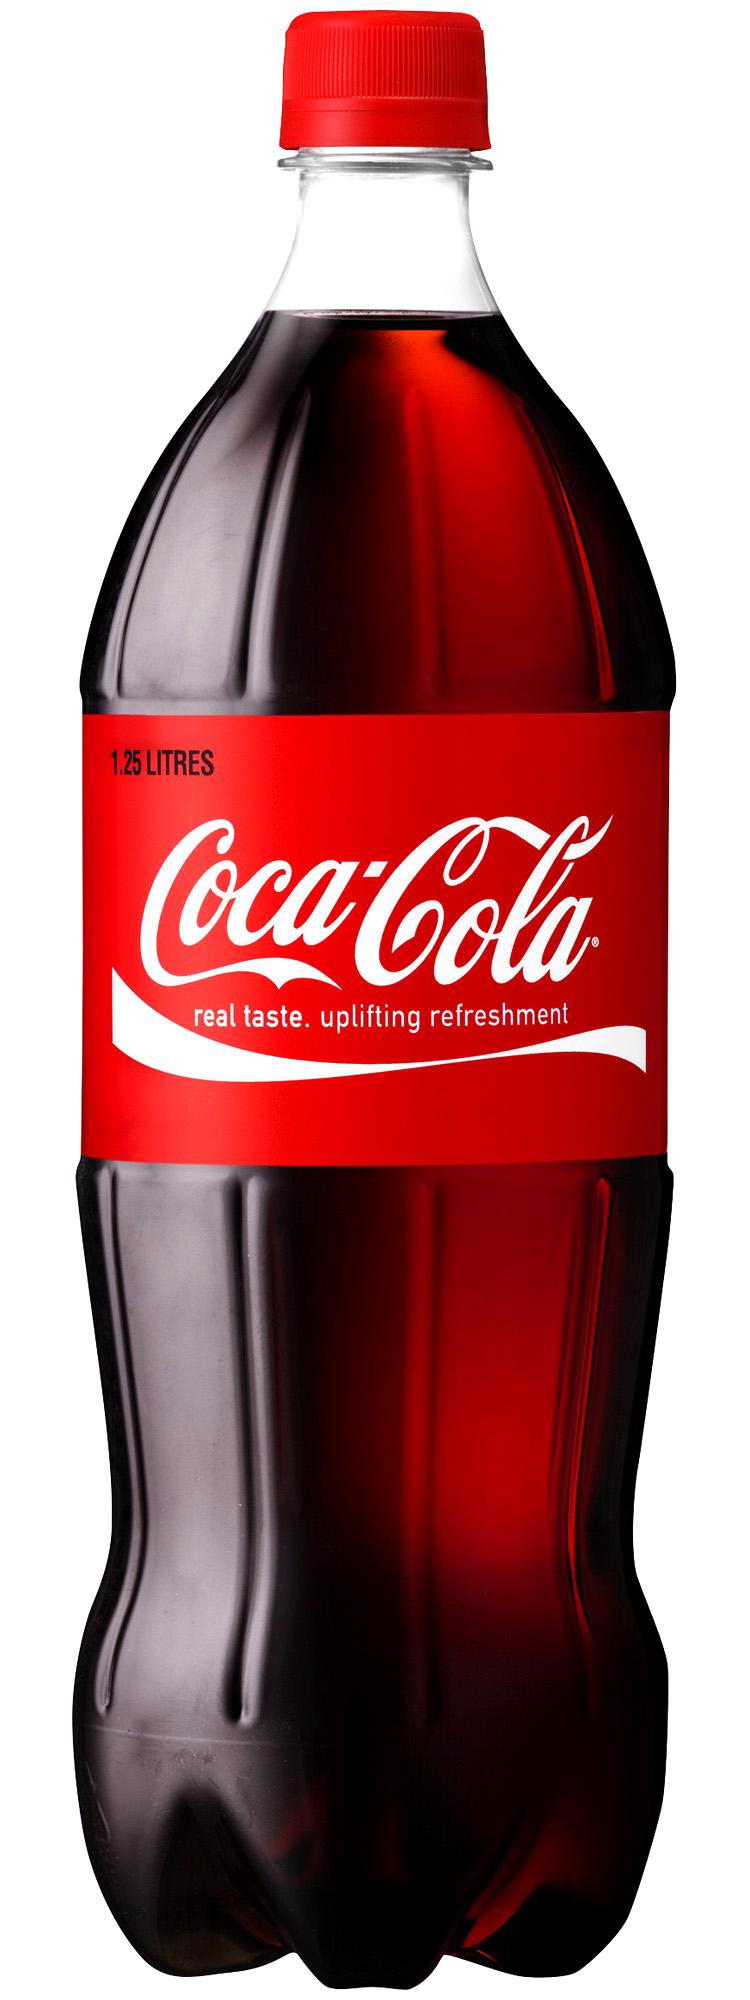 Coca Cola bottle PNG image - PNG Cola